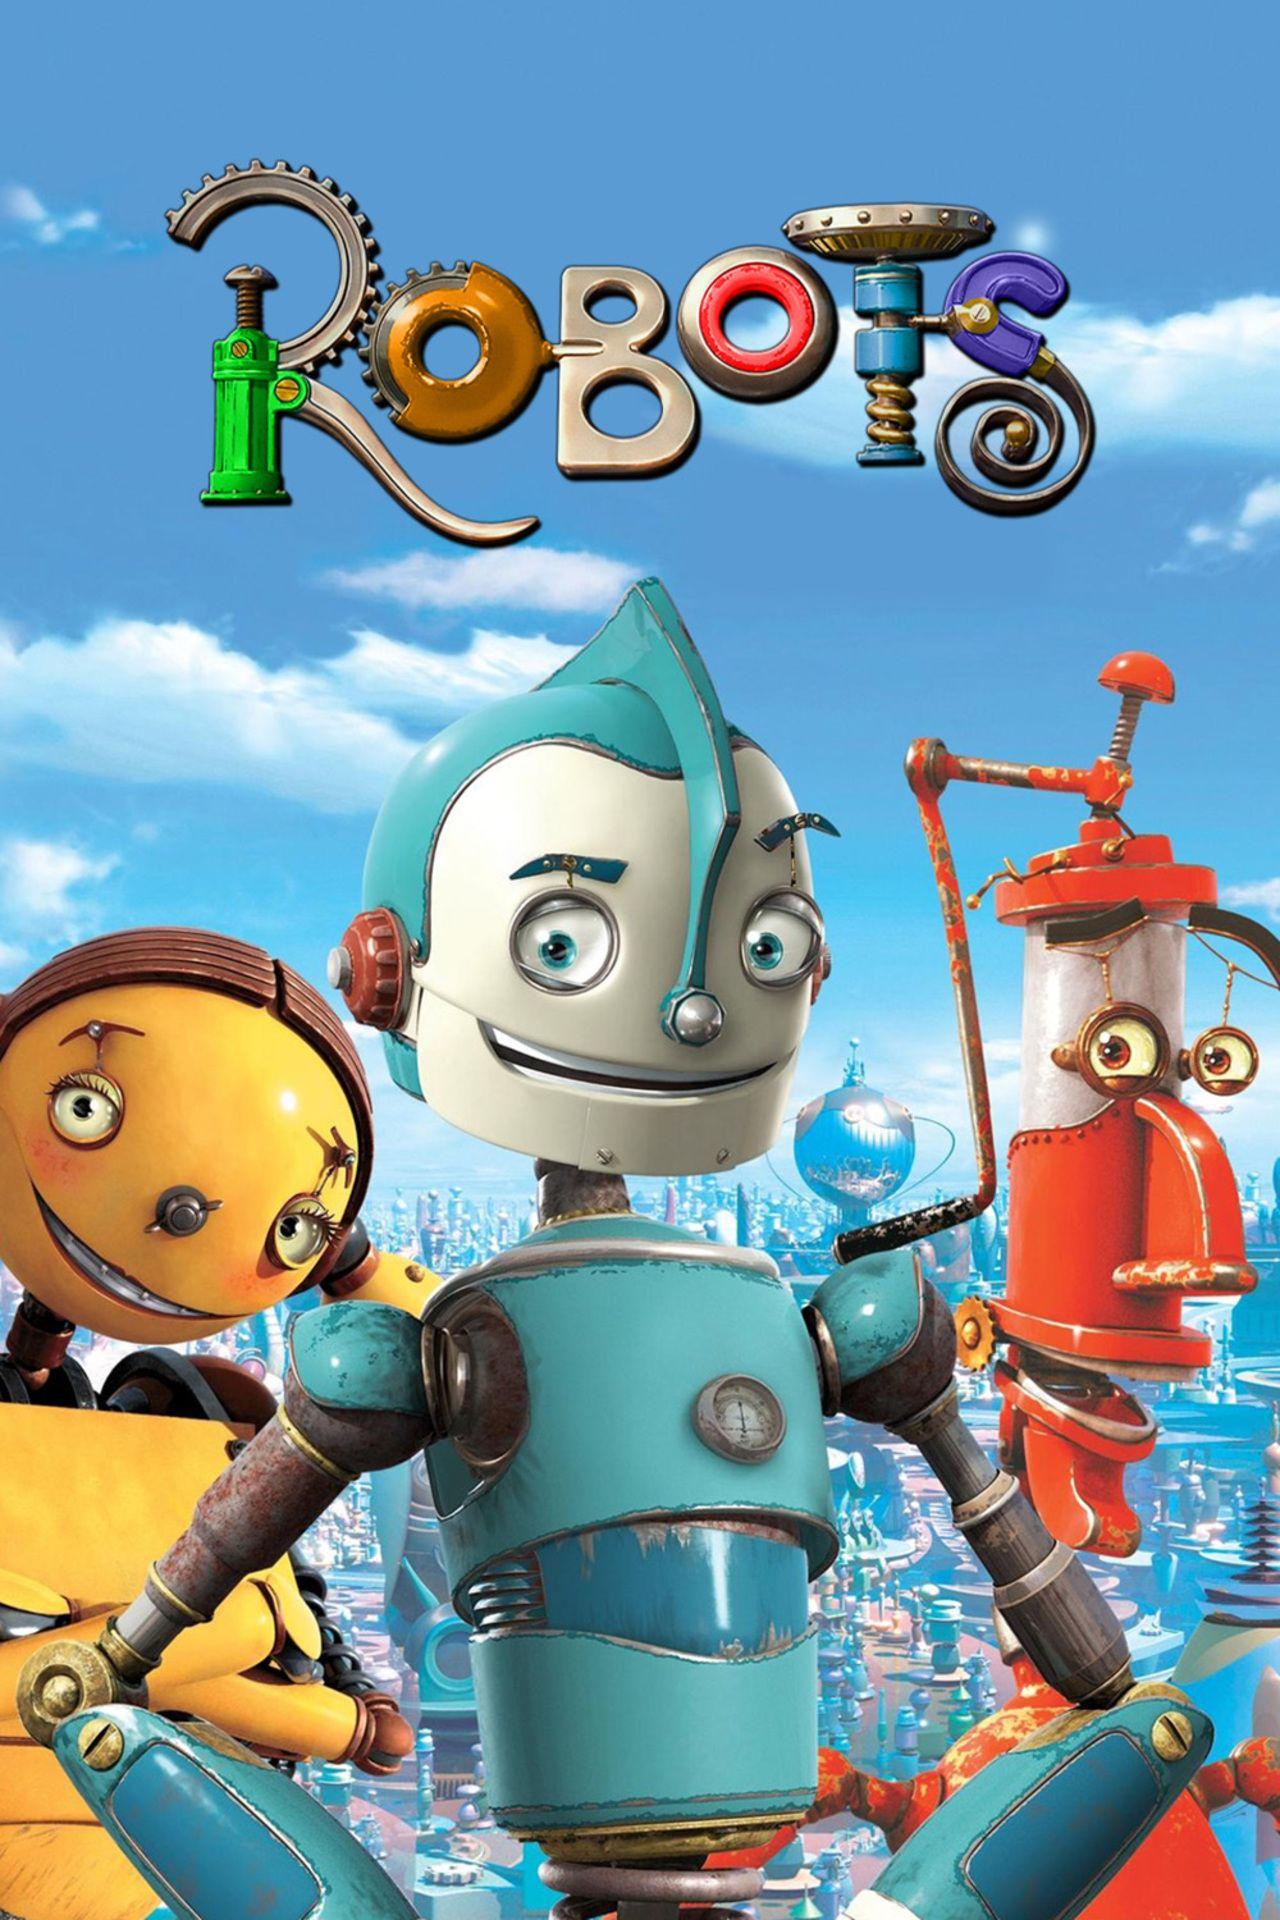 Robots 2005 Peliculas Infantiles De Disney Peliculas Infantiles En Espanol Peliculas